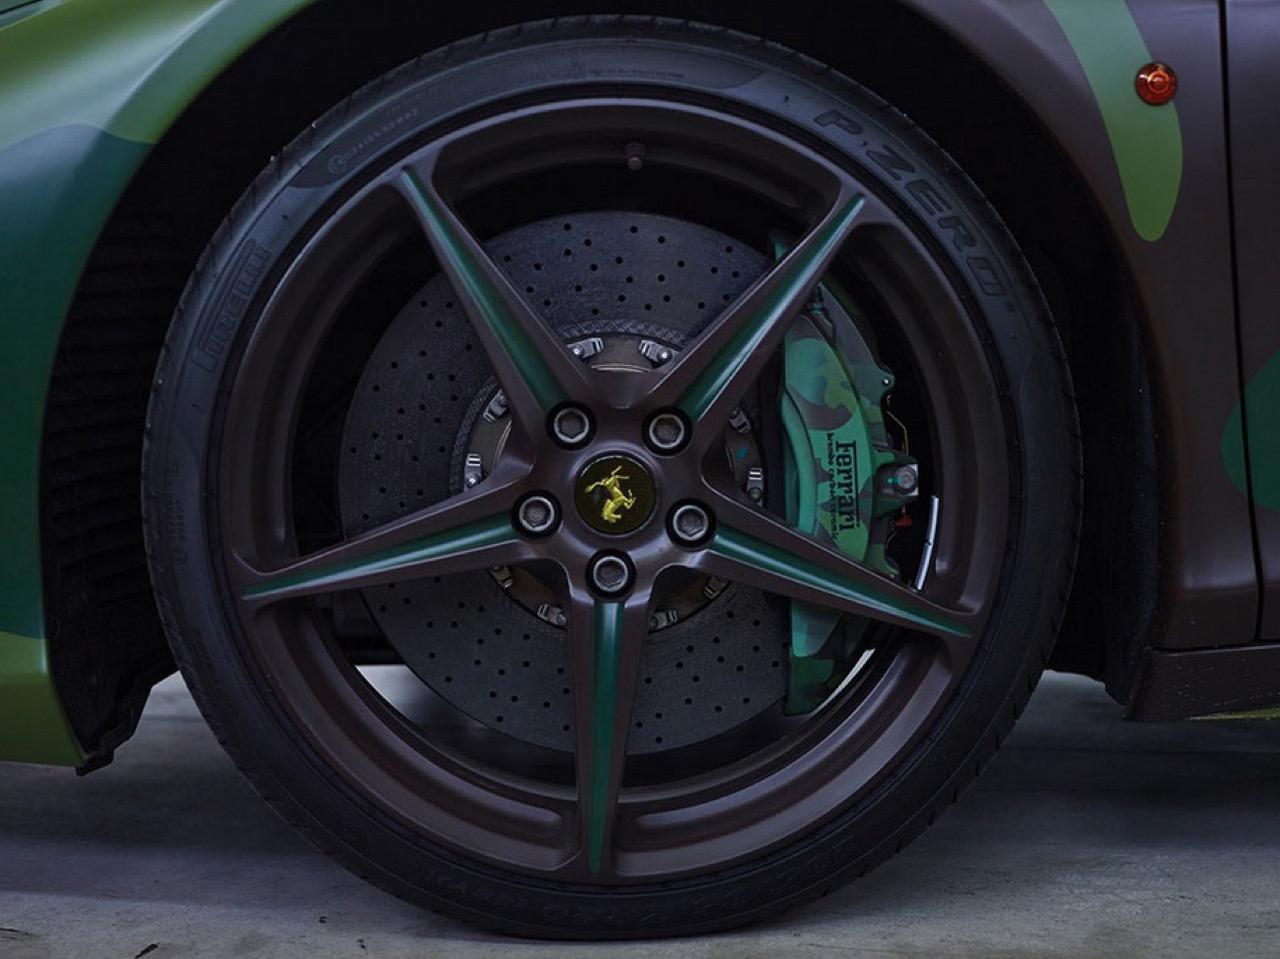 Ferrari 458 Italia Lapo Elkann in auction (6)